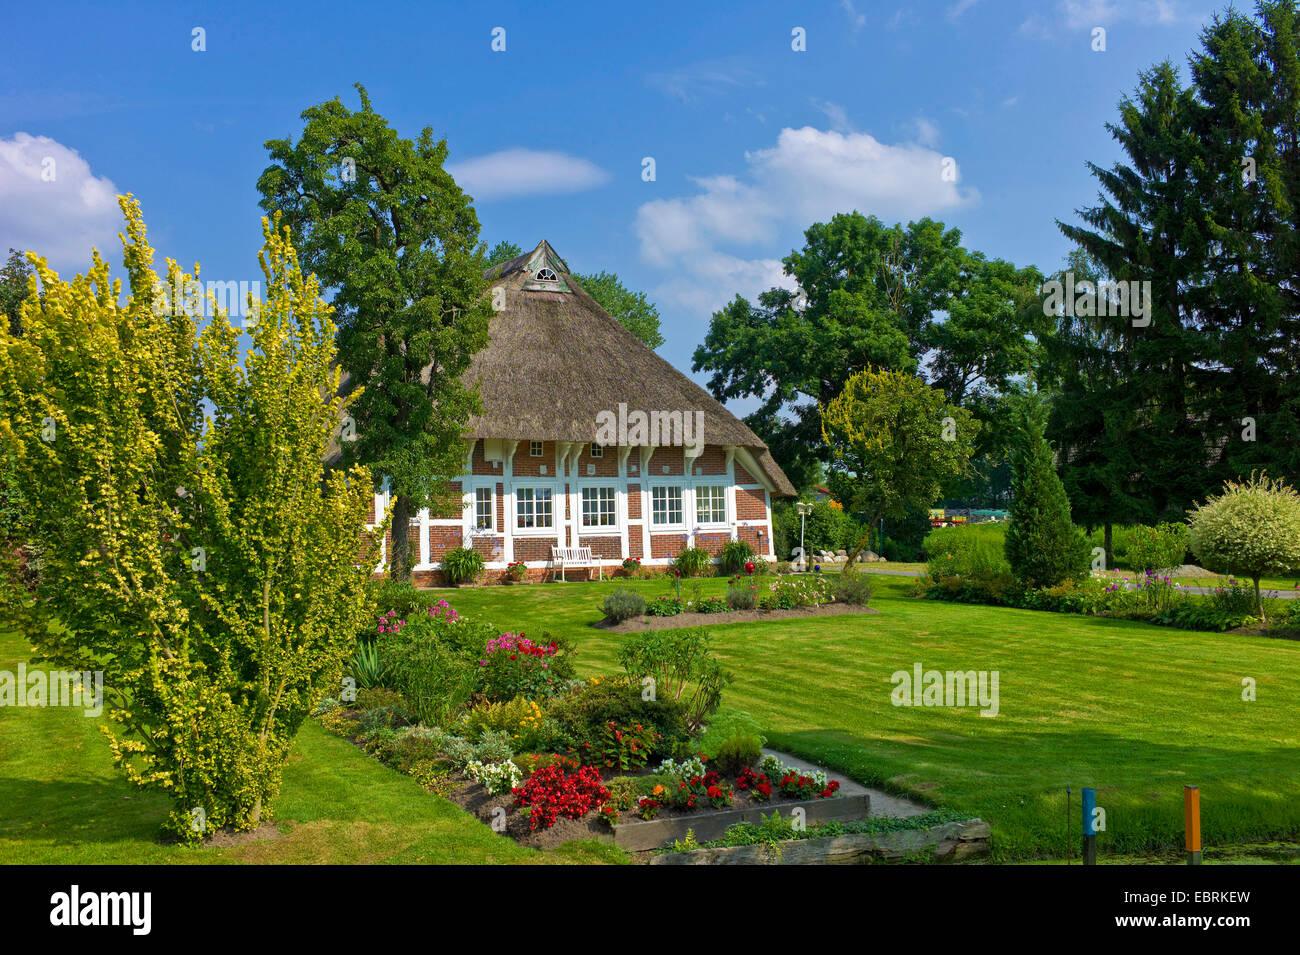 old groomed Lower Saxon farmhouse, Germany, Lower Saxony, Wesermarsch, Moorriem - Stock Image